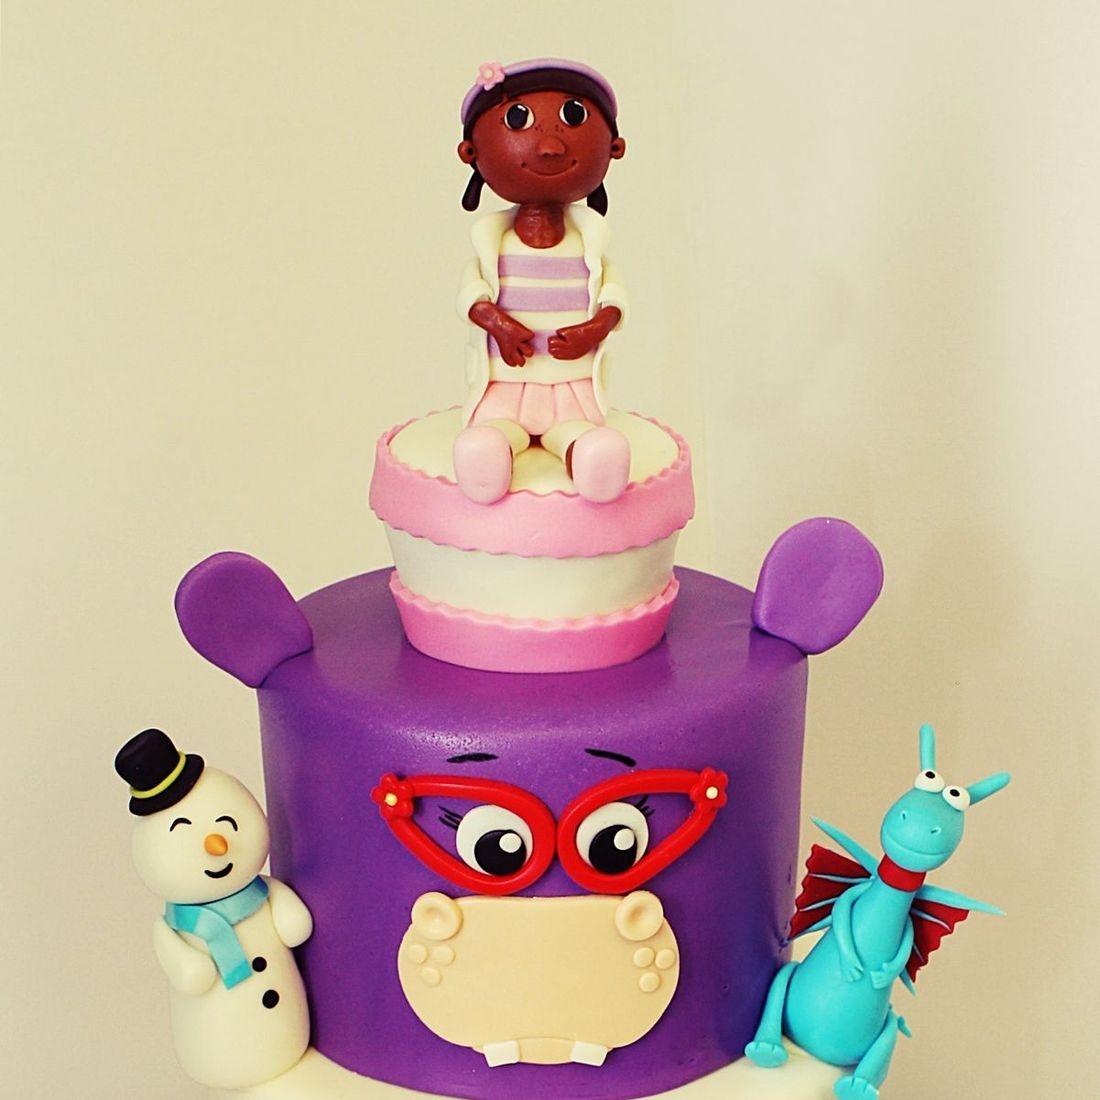 Doc McStuffins & Friends Cake Milwaukee